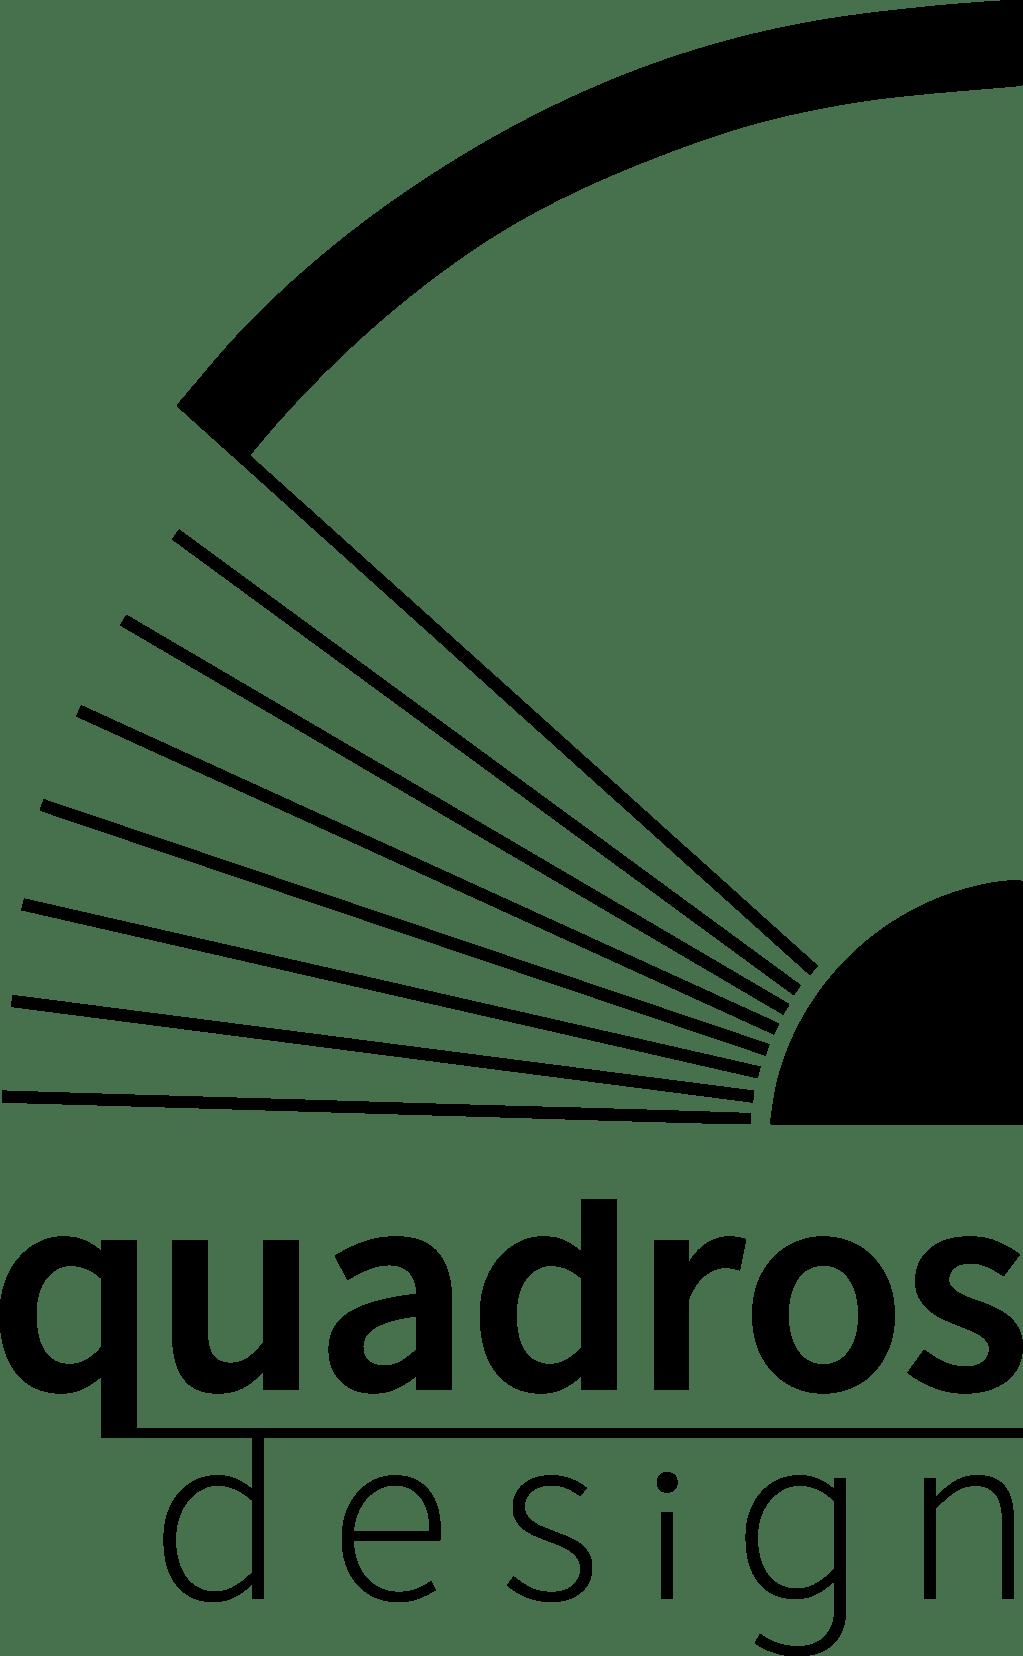 Quadrosdesign